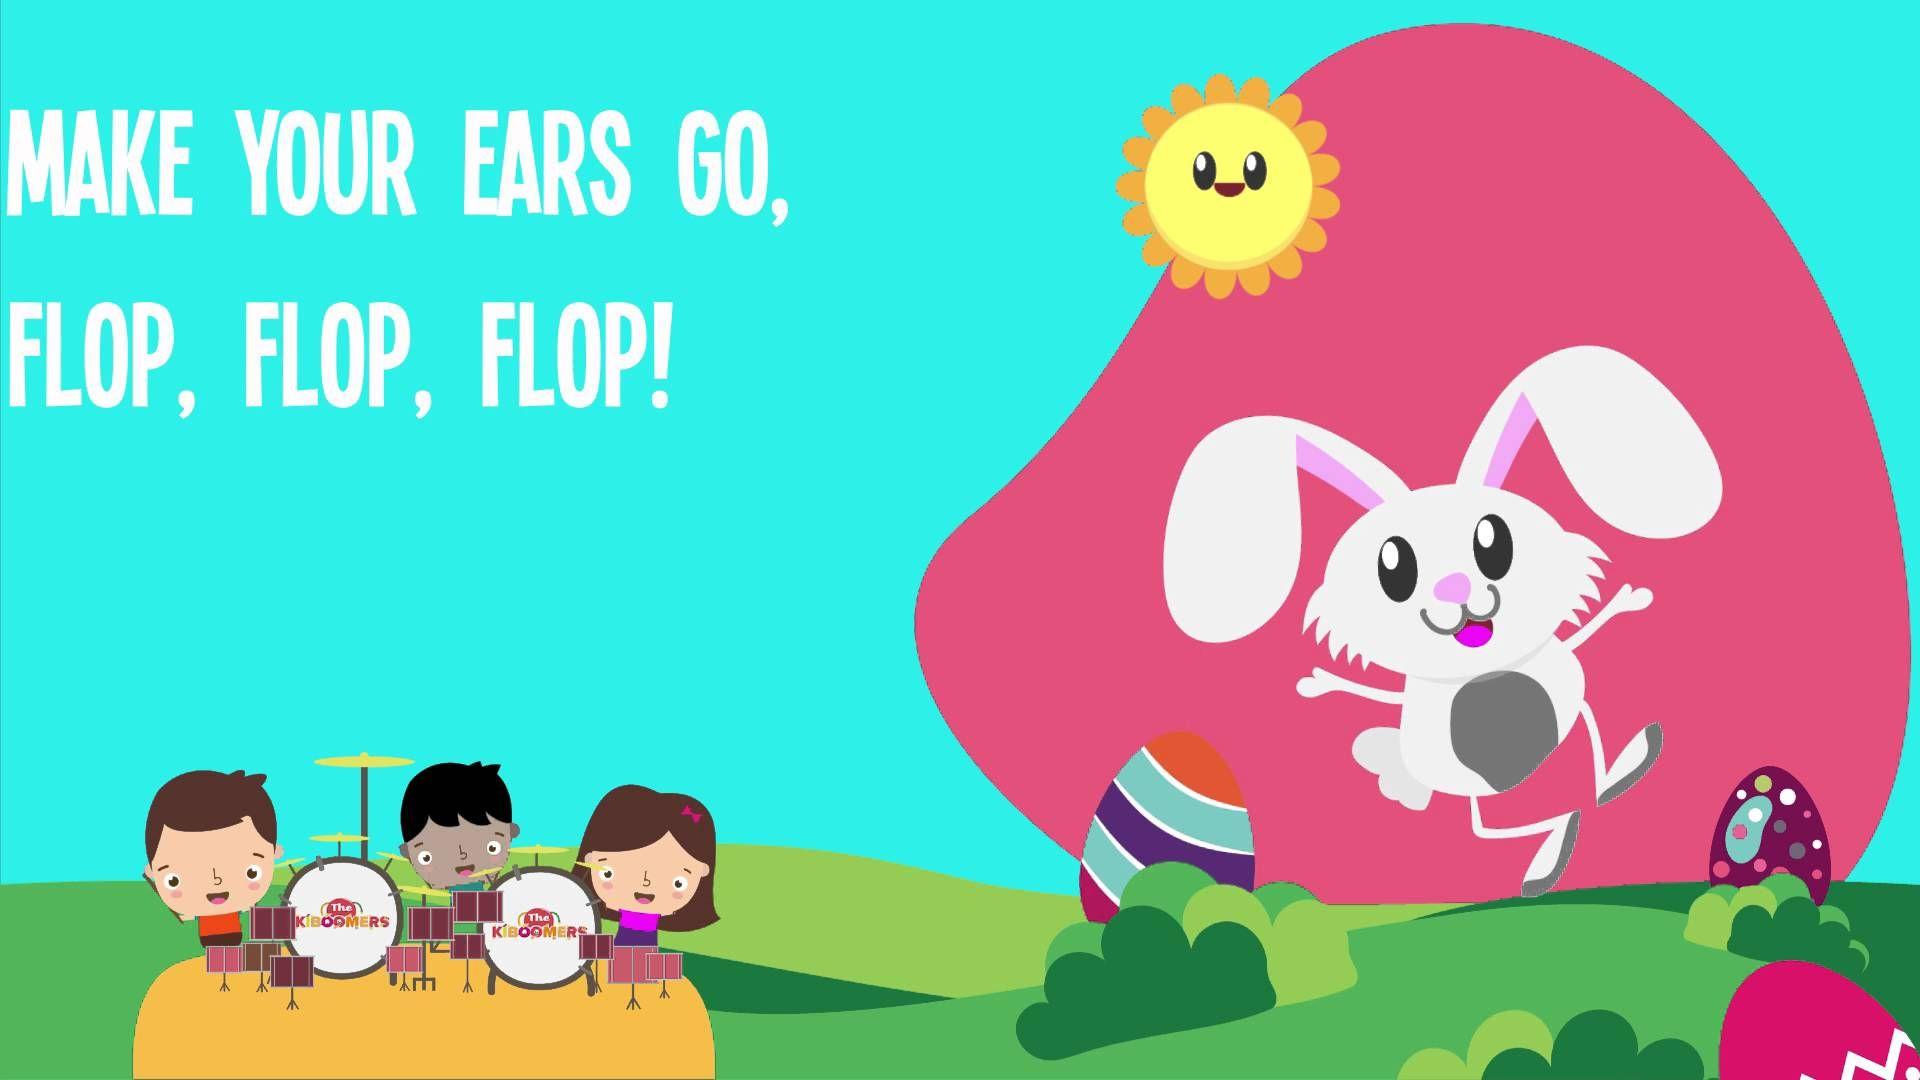 Easter Bunny Hop Hop Hop Song Lyrics for Kids | Nursery Rhymes for ...